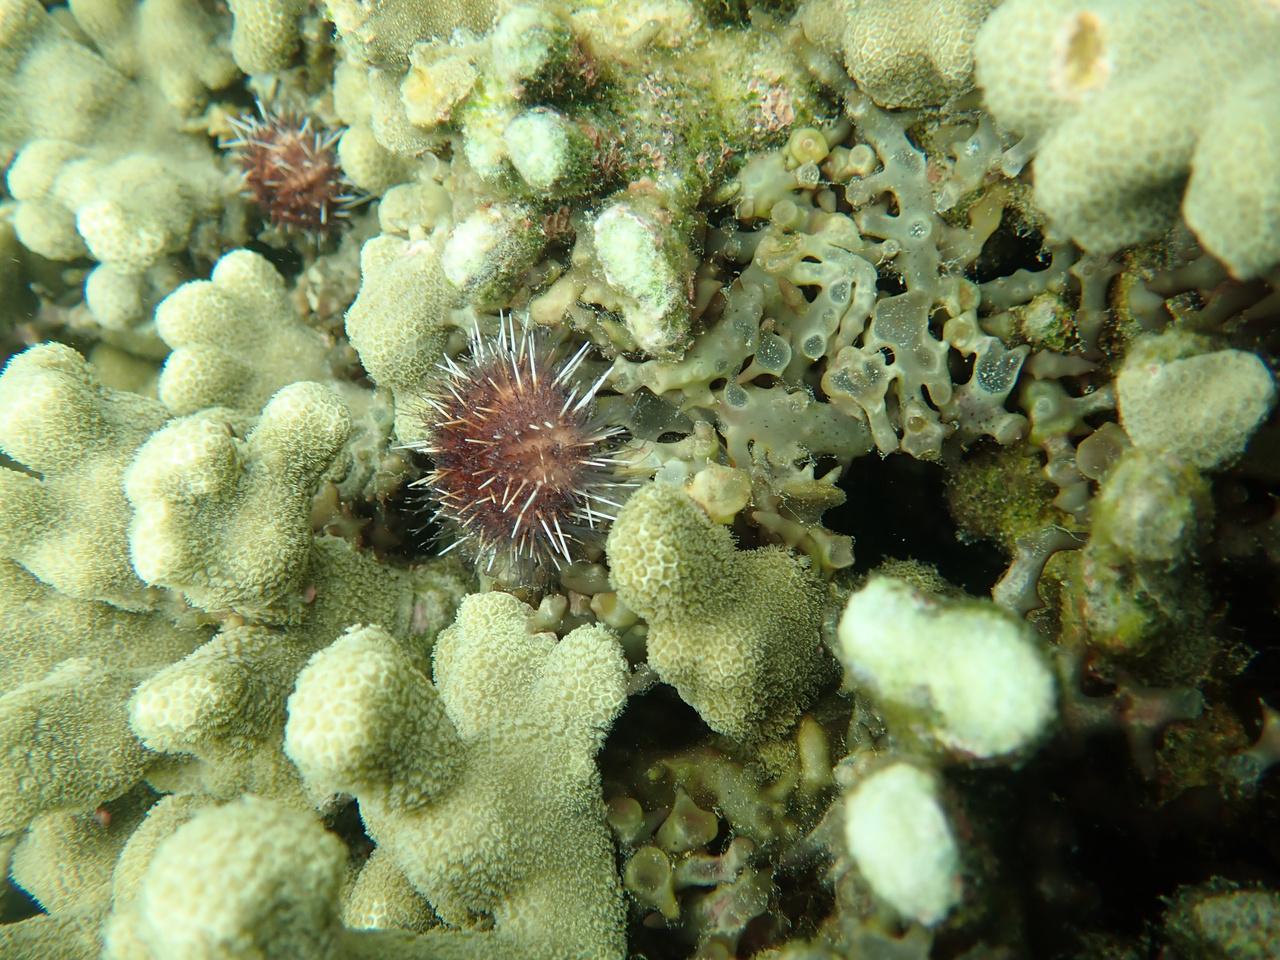 Cape Flattery Coral Restoration Sea Urchin Algea Eaters 4000x3000 NOAA Fisheries Matthew Parry.jpg